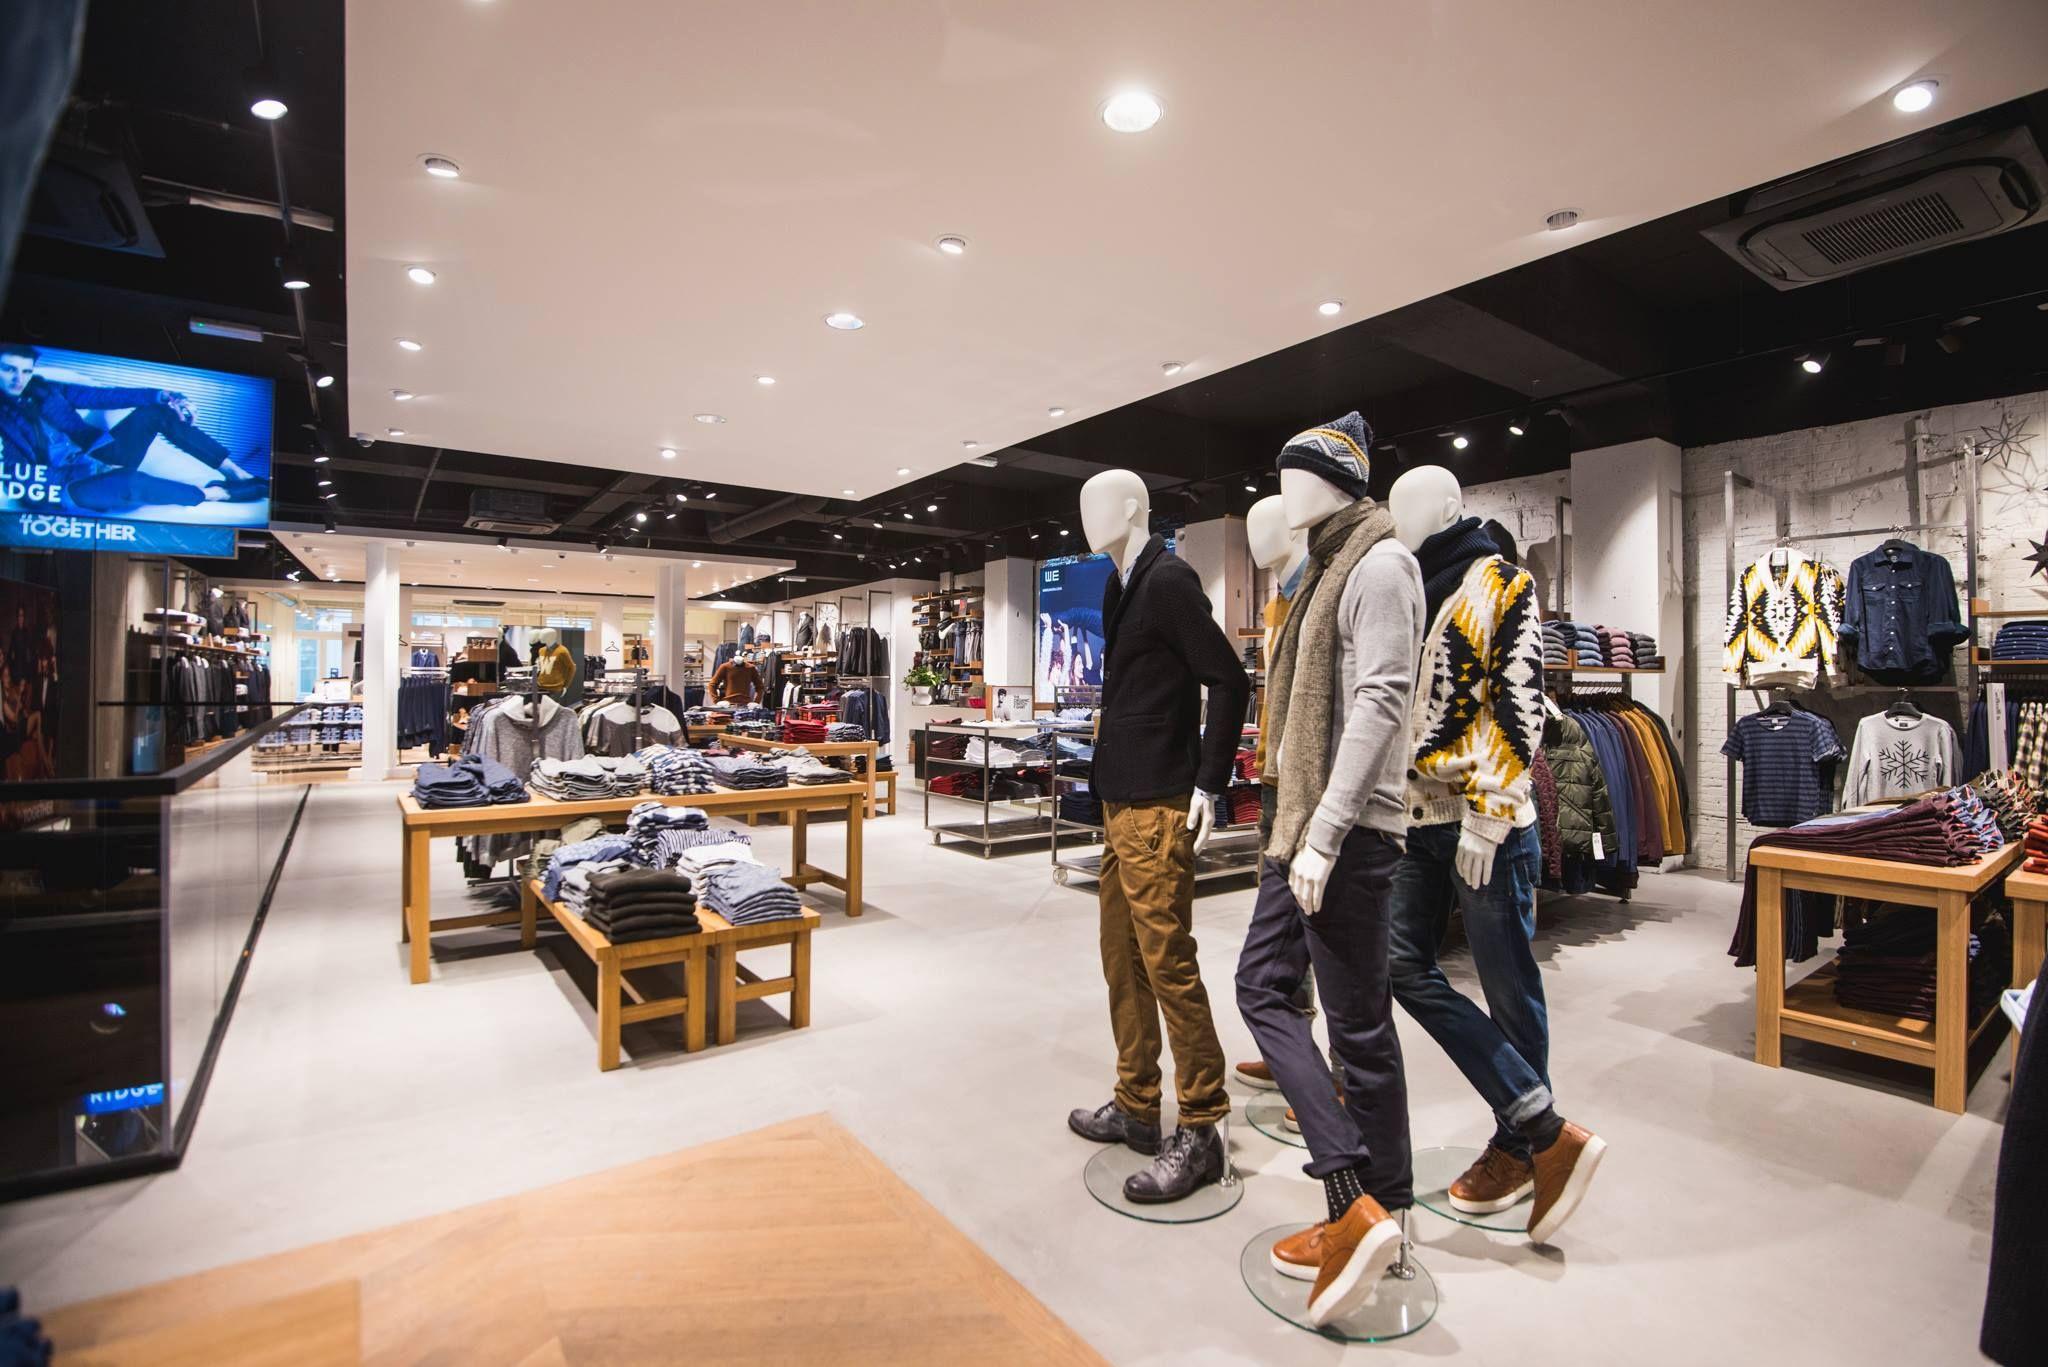 eurocol betondesign we fashion gent shop interior design